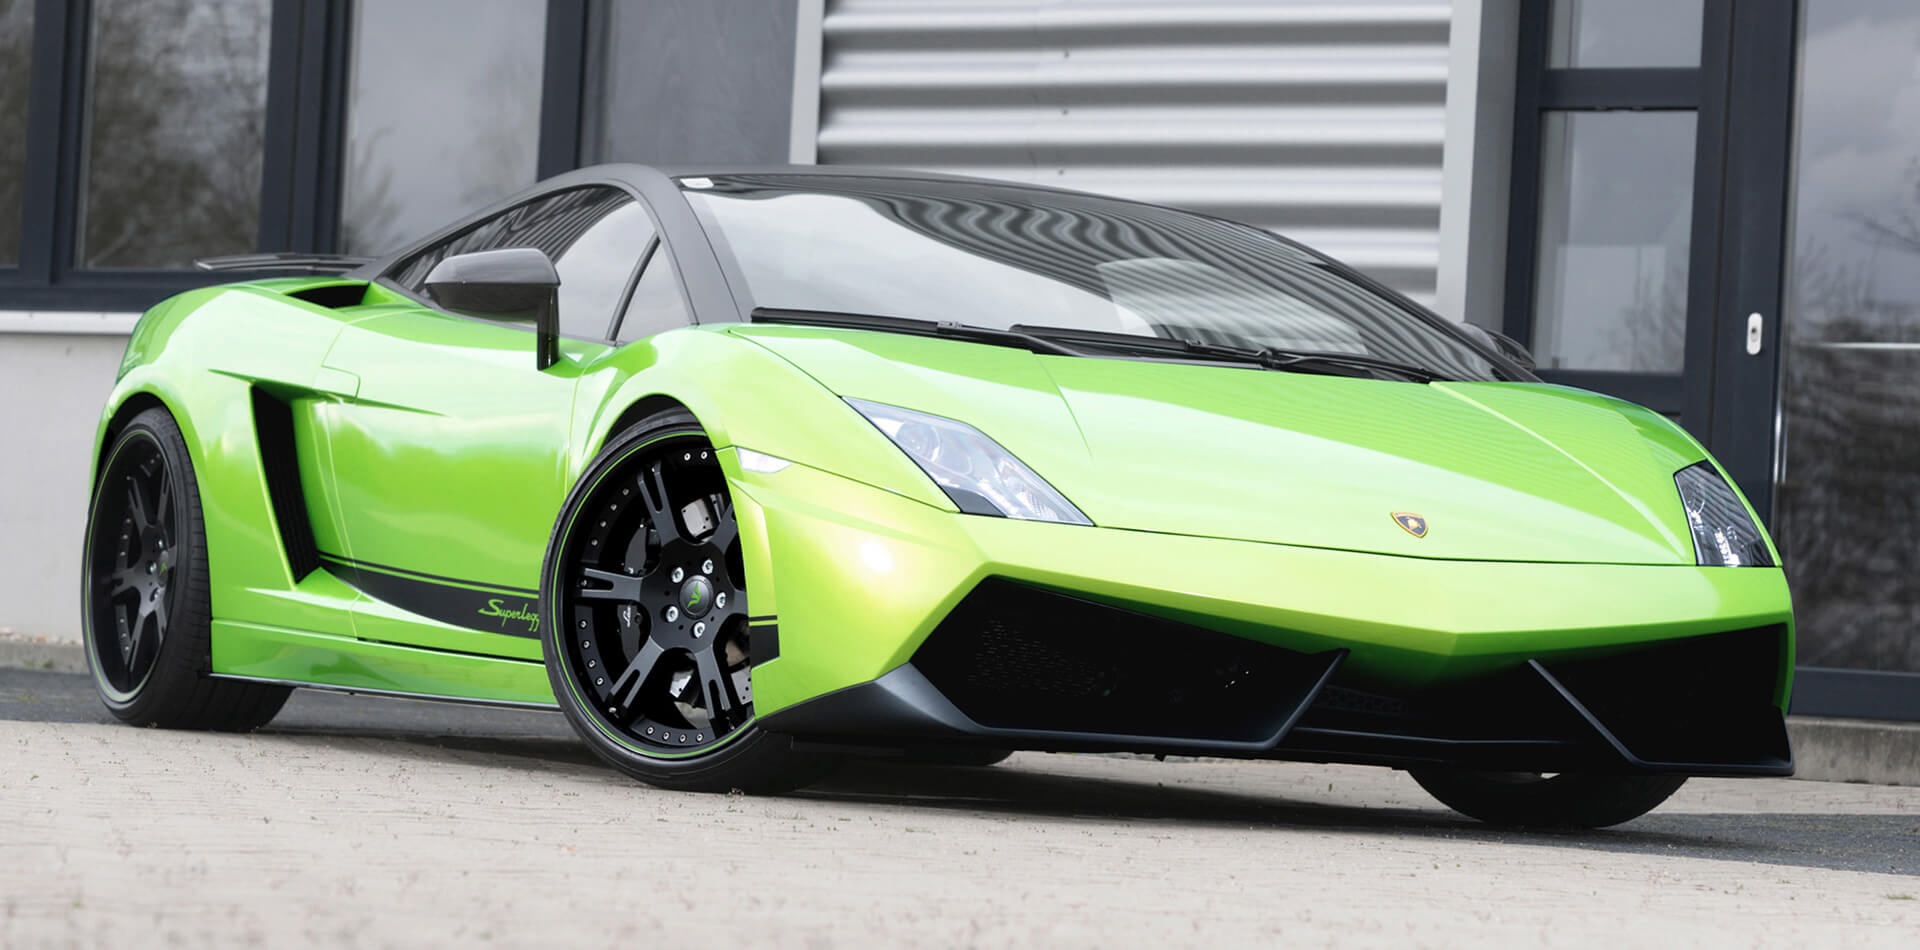 Grün folierter Lamborghini Superleggera by Wheelsandmore Tuning Deutschland